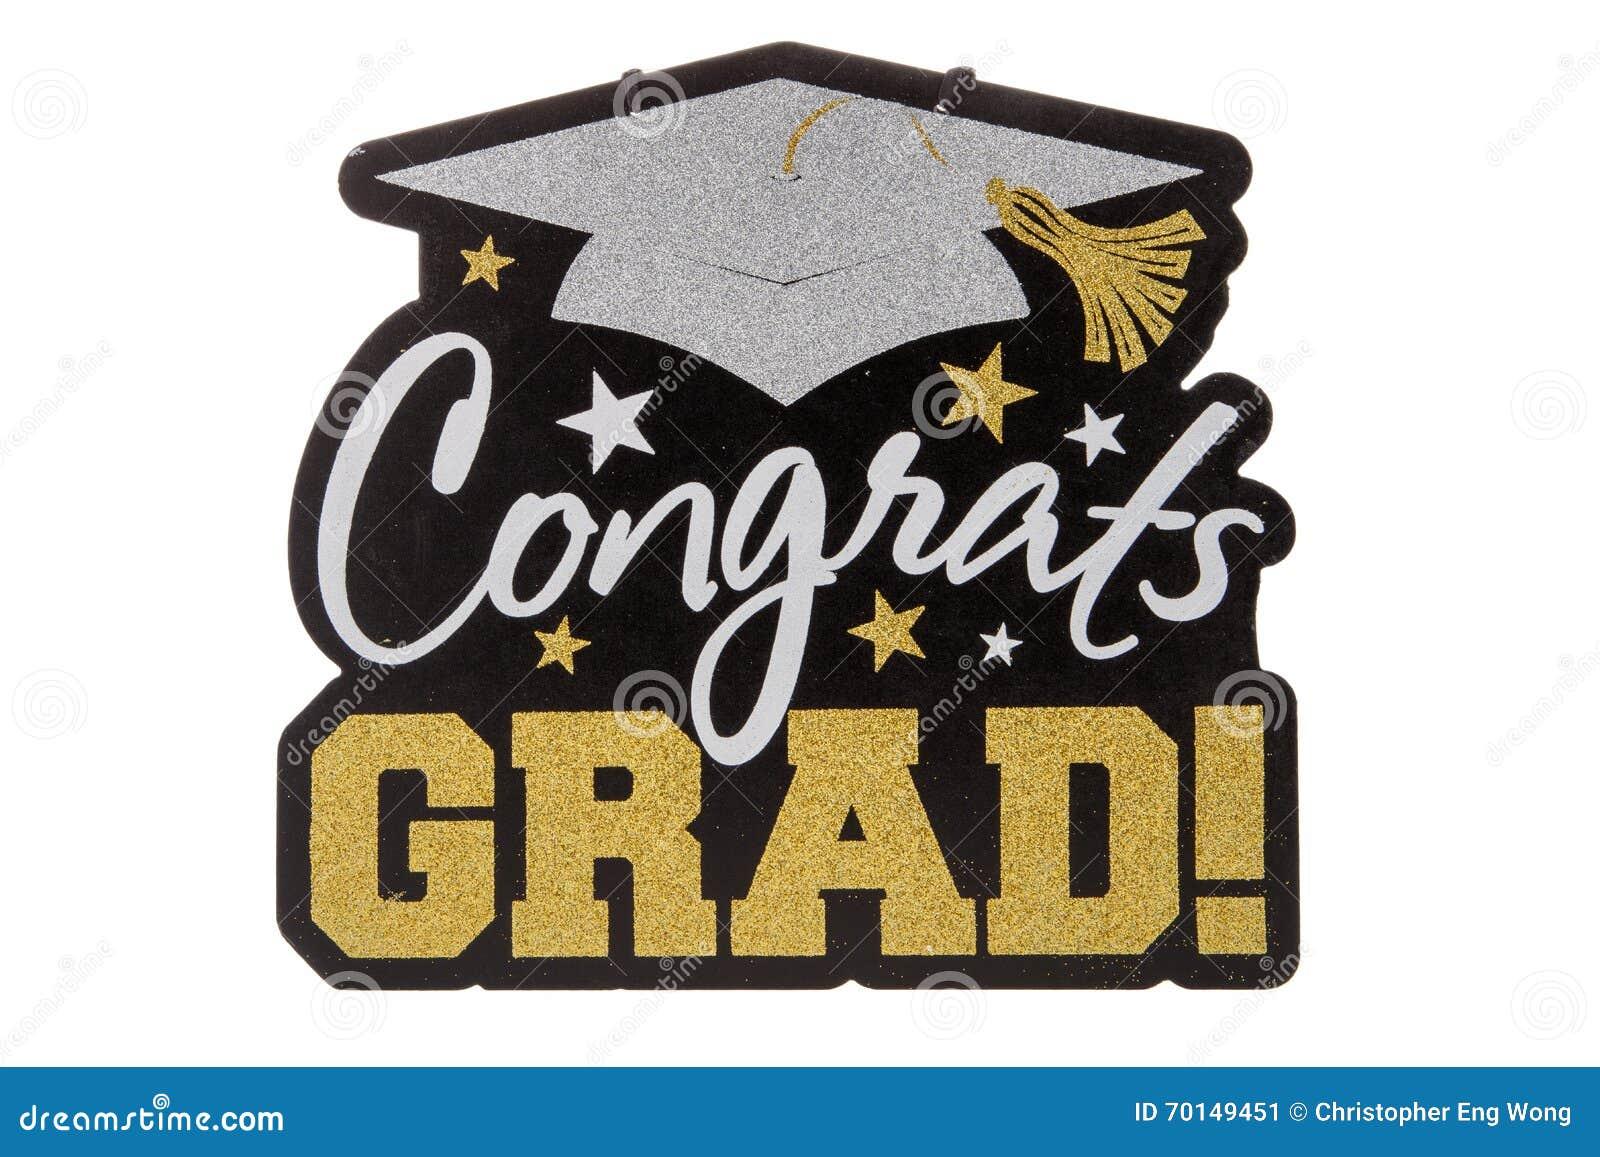 graduation sign stock image image of graduate achievement 70149451